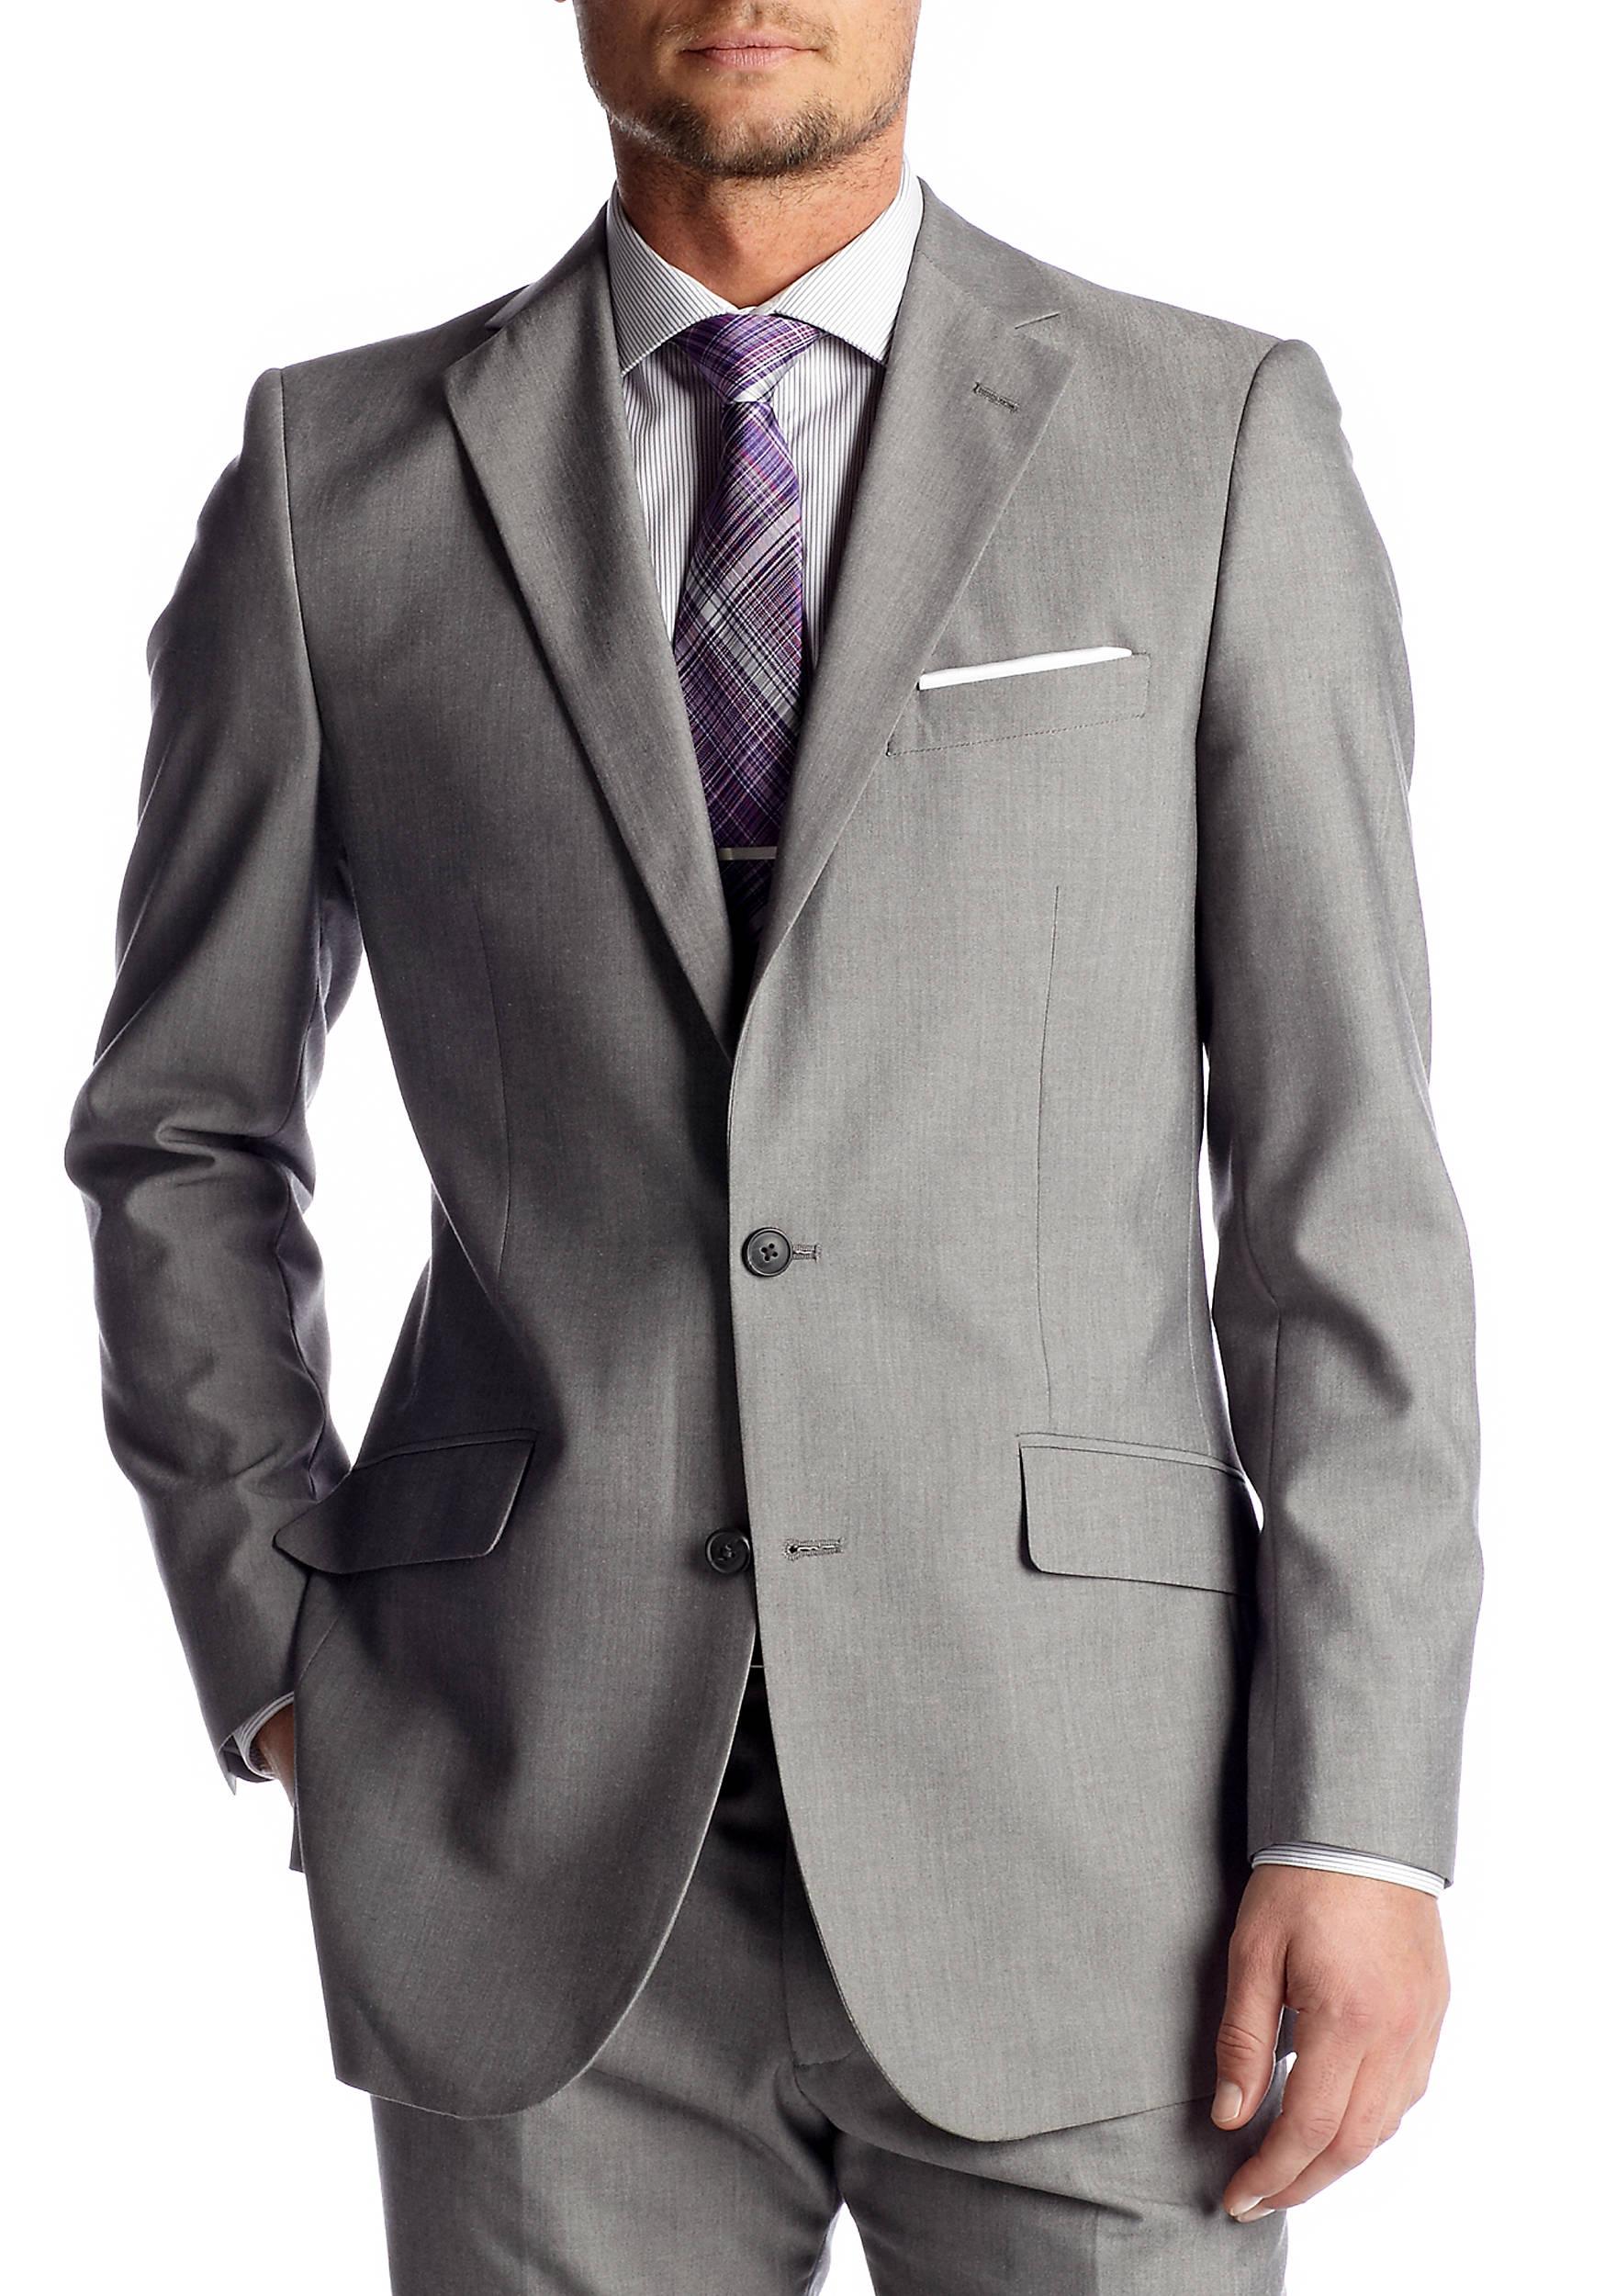 Madison Slim-Fit Light Gray Suit Separate Coat | belk